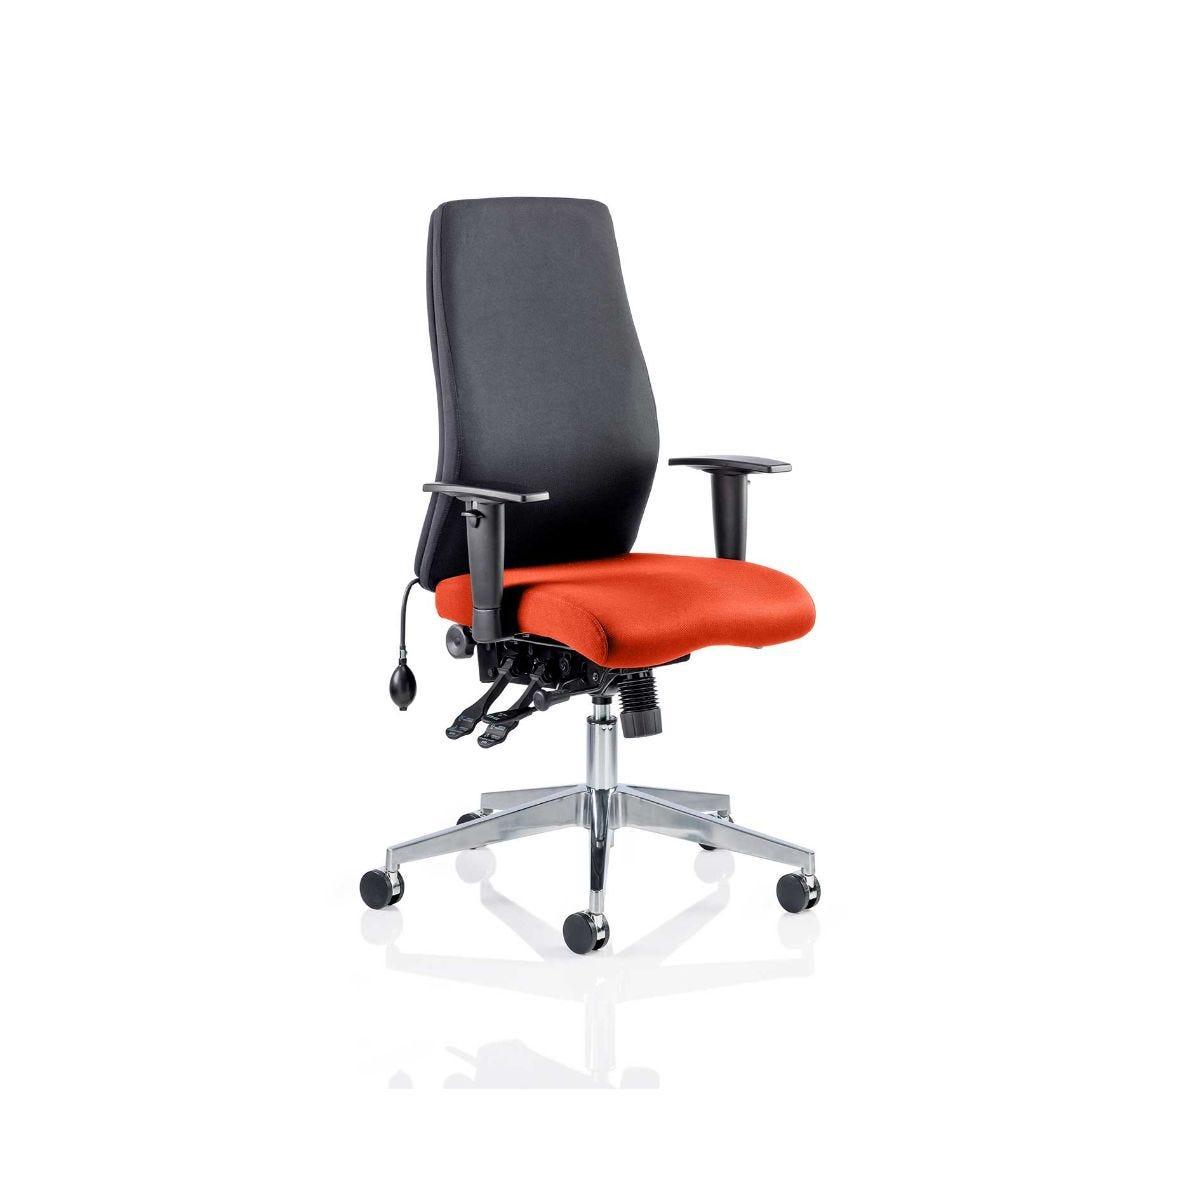 Onyx Office Chair, Pimento